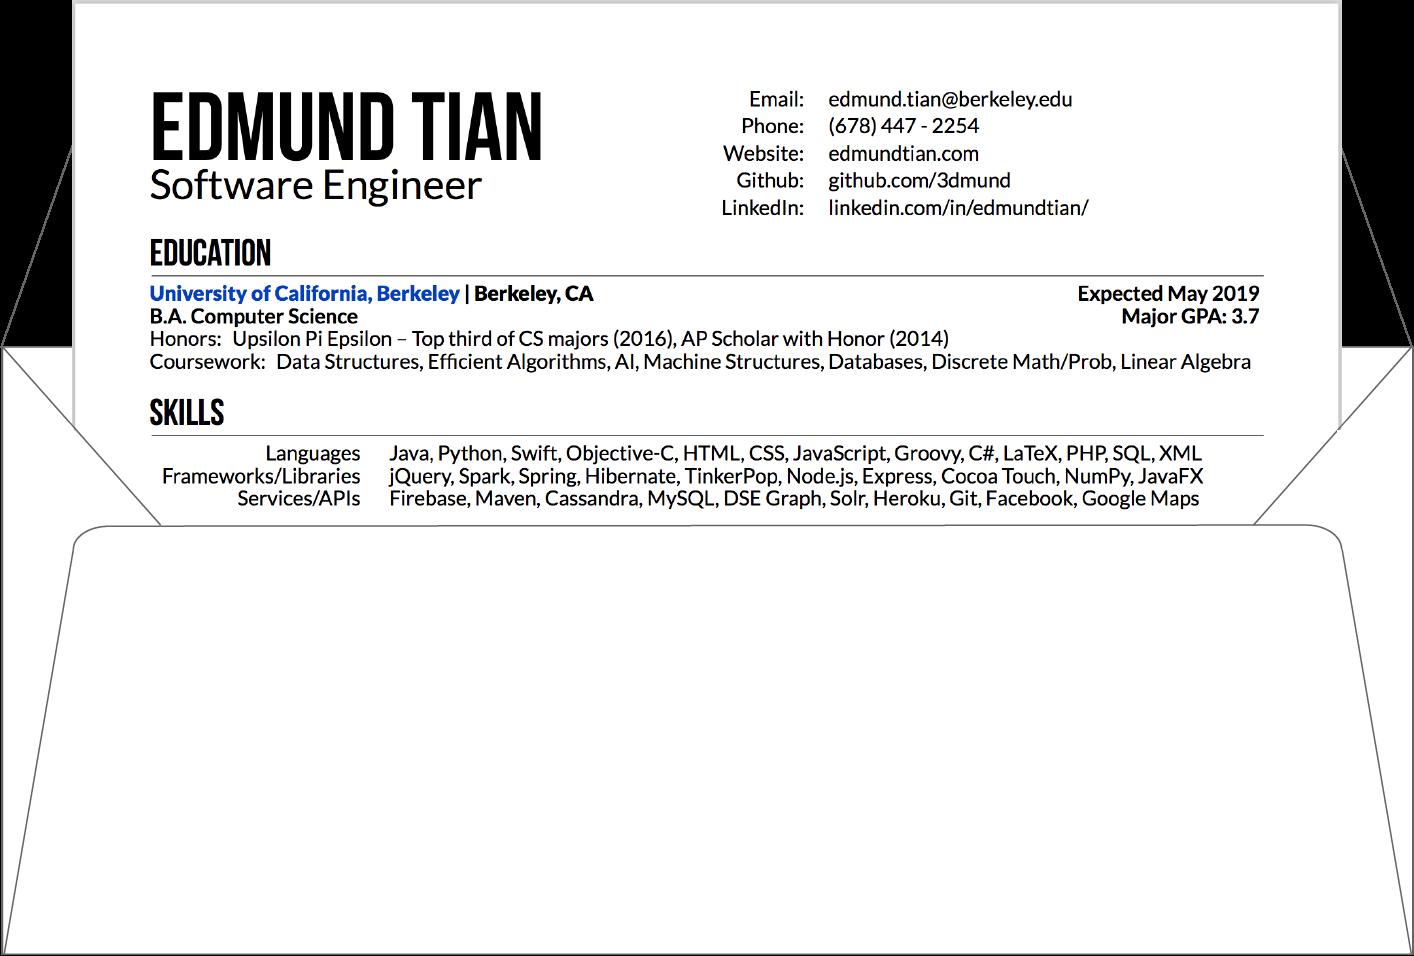 Edmund Tian